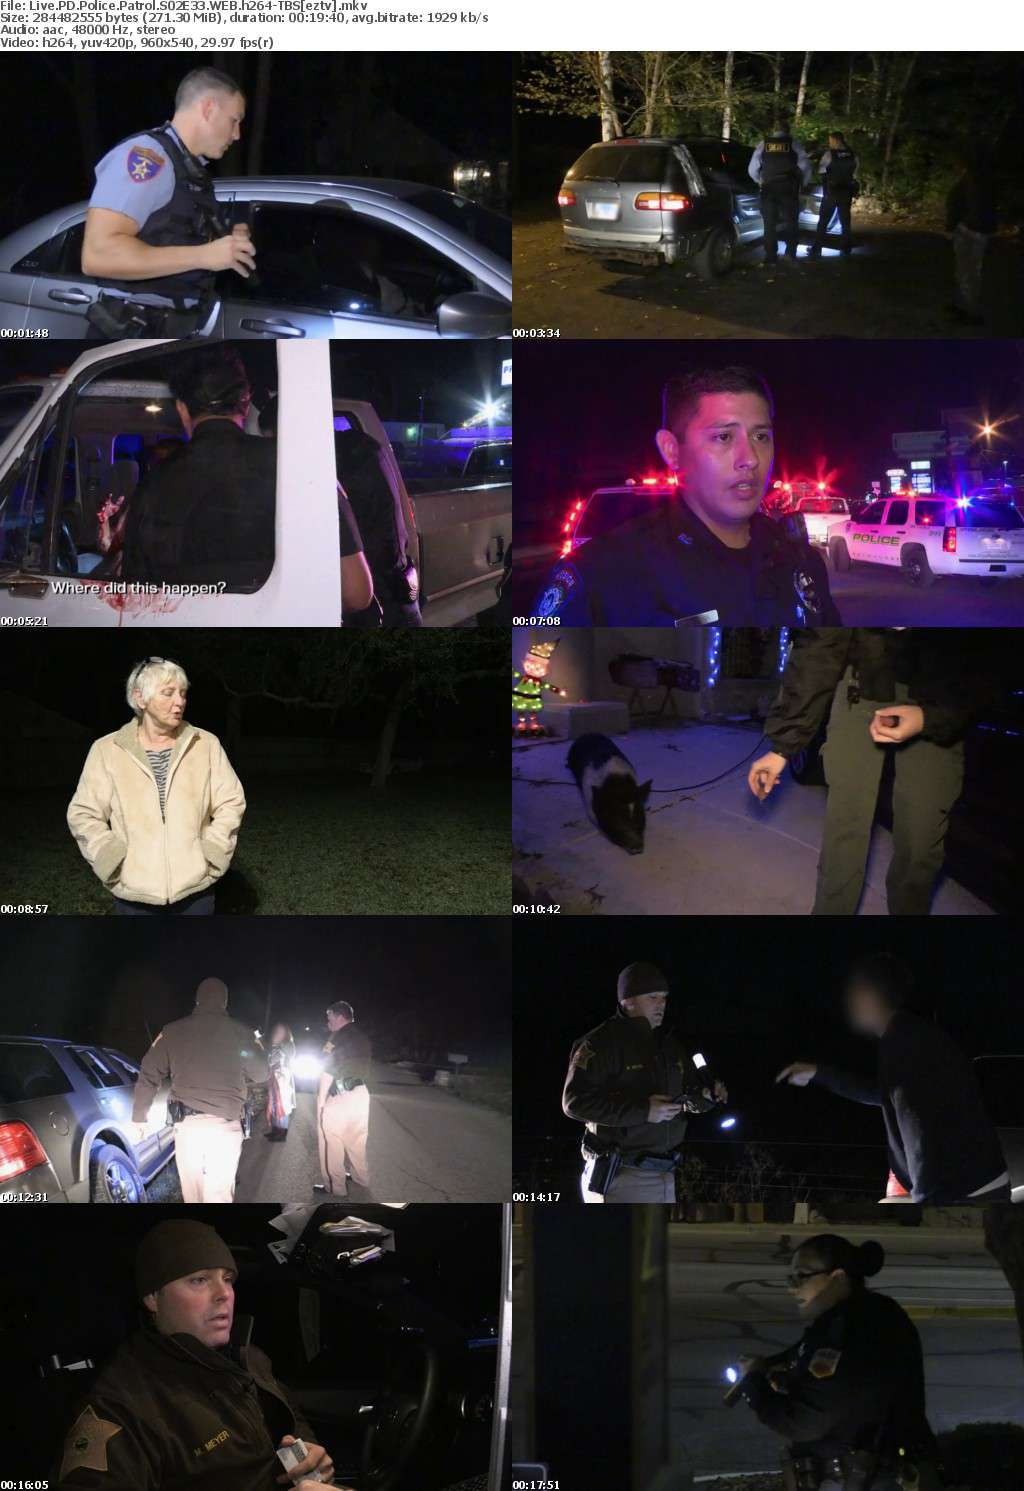 Live PD Police Patrol S02E33 WEB h264-TBS